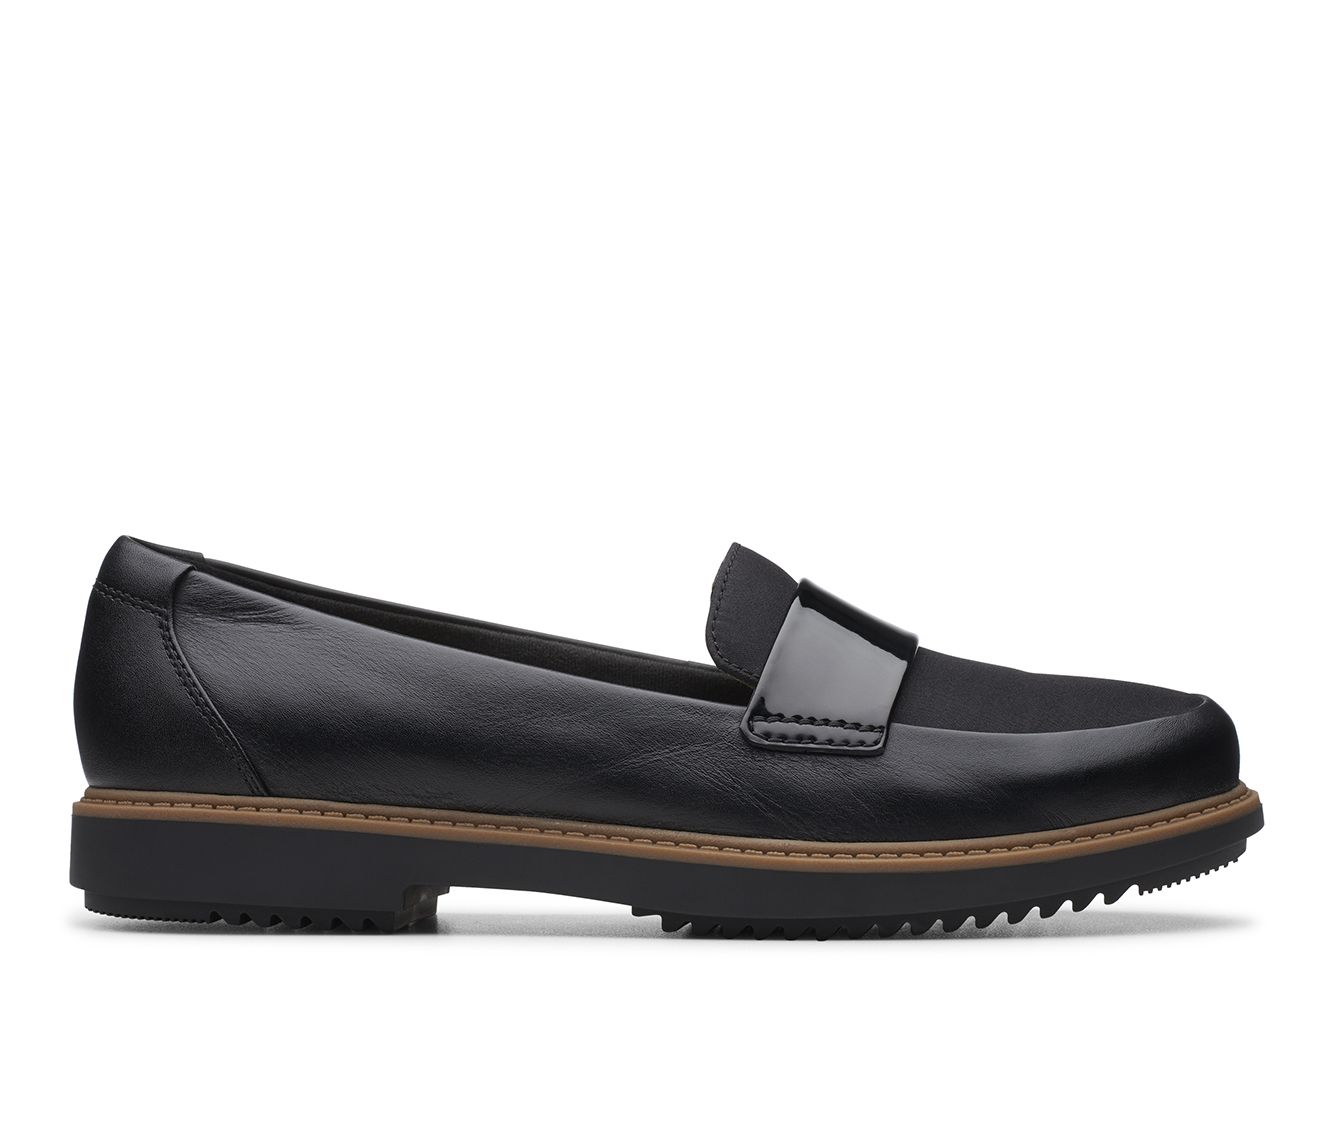 Clarks Raisie Arlie Women's Shoe (Black Leather)